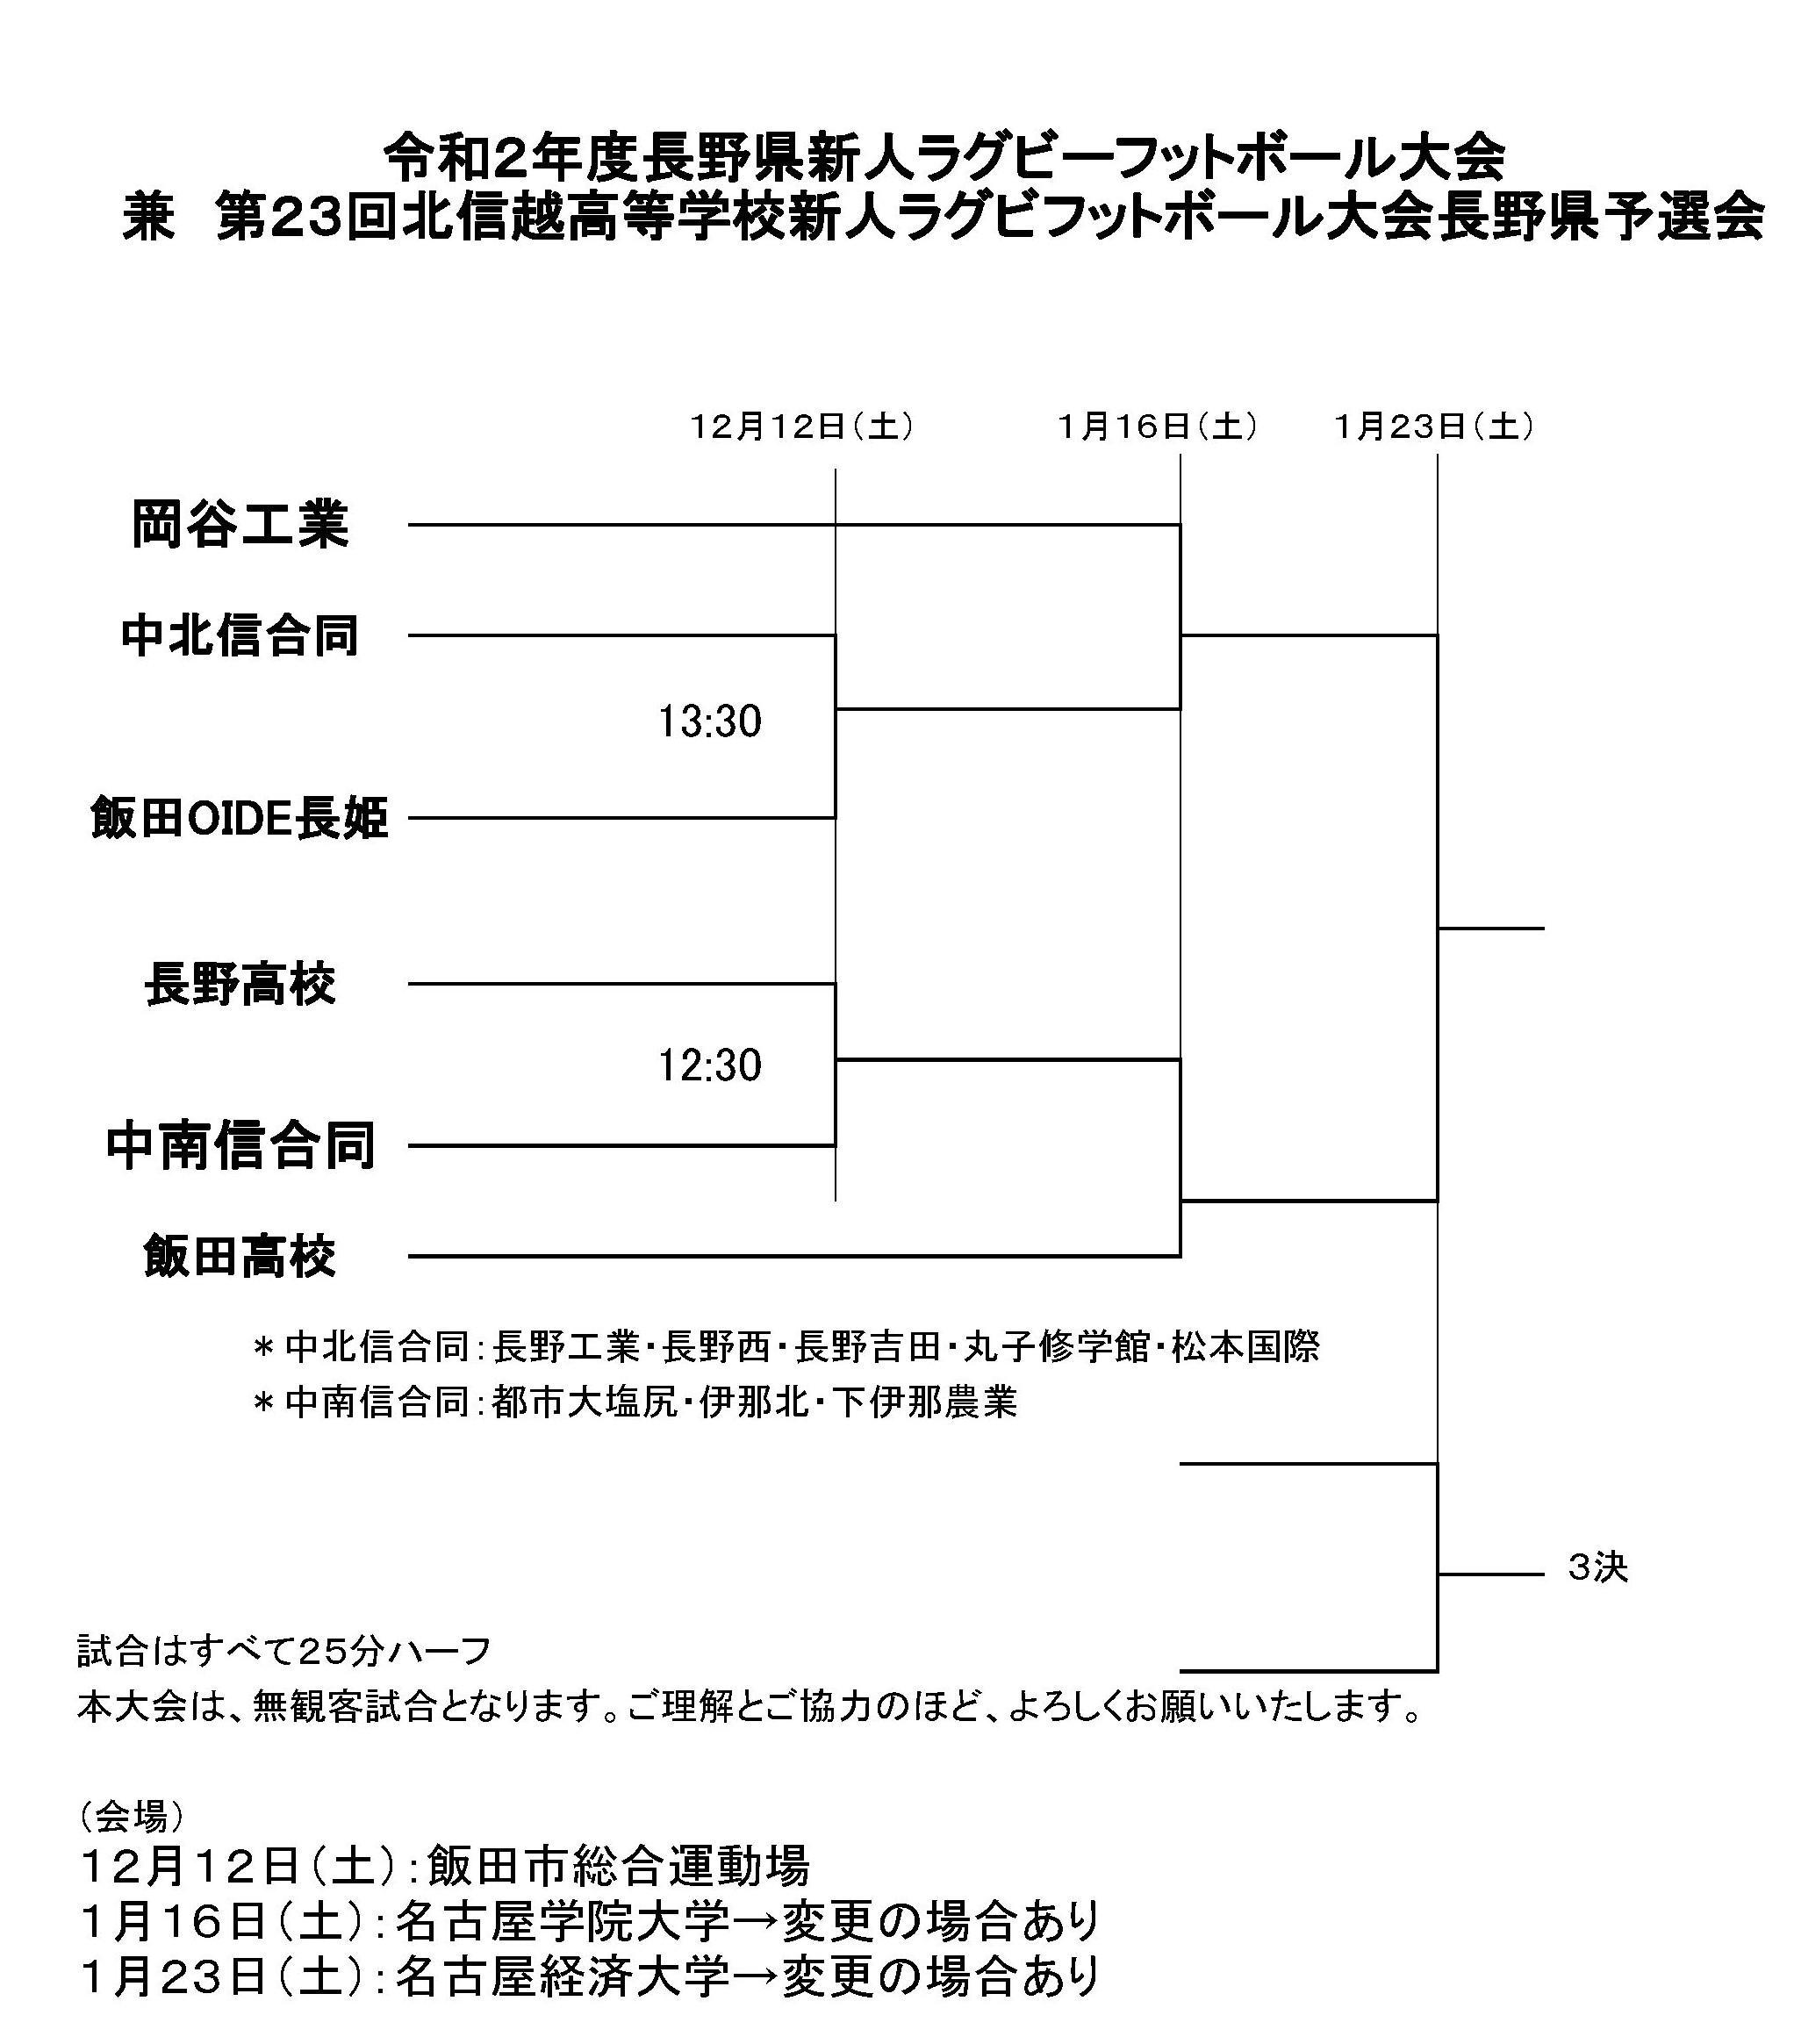 2020-shinjin-20201201.jpg